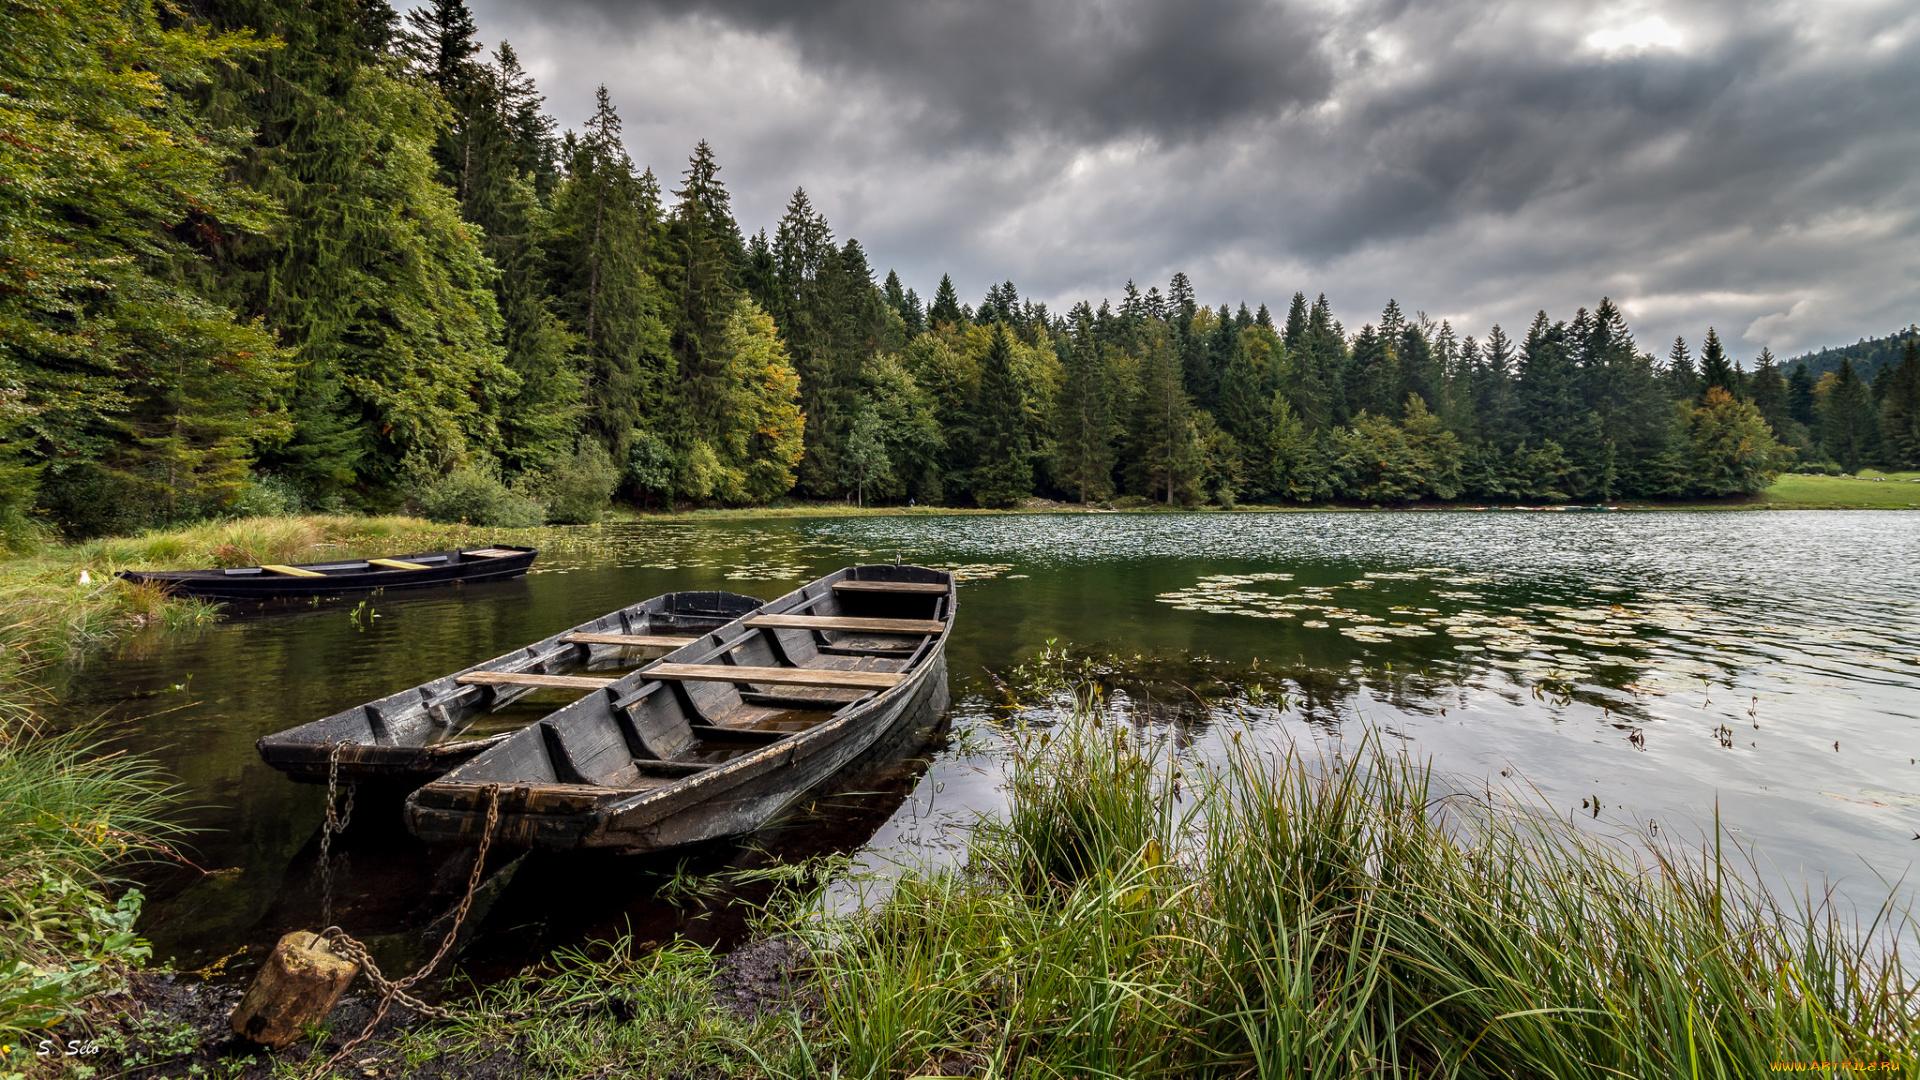 лодка река горы лес без смс